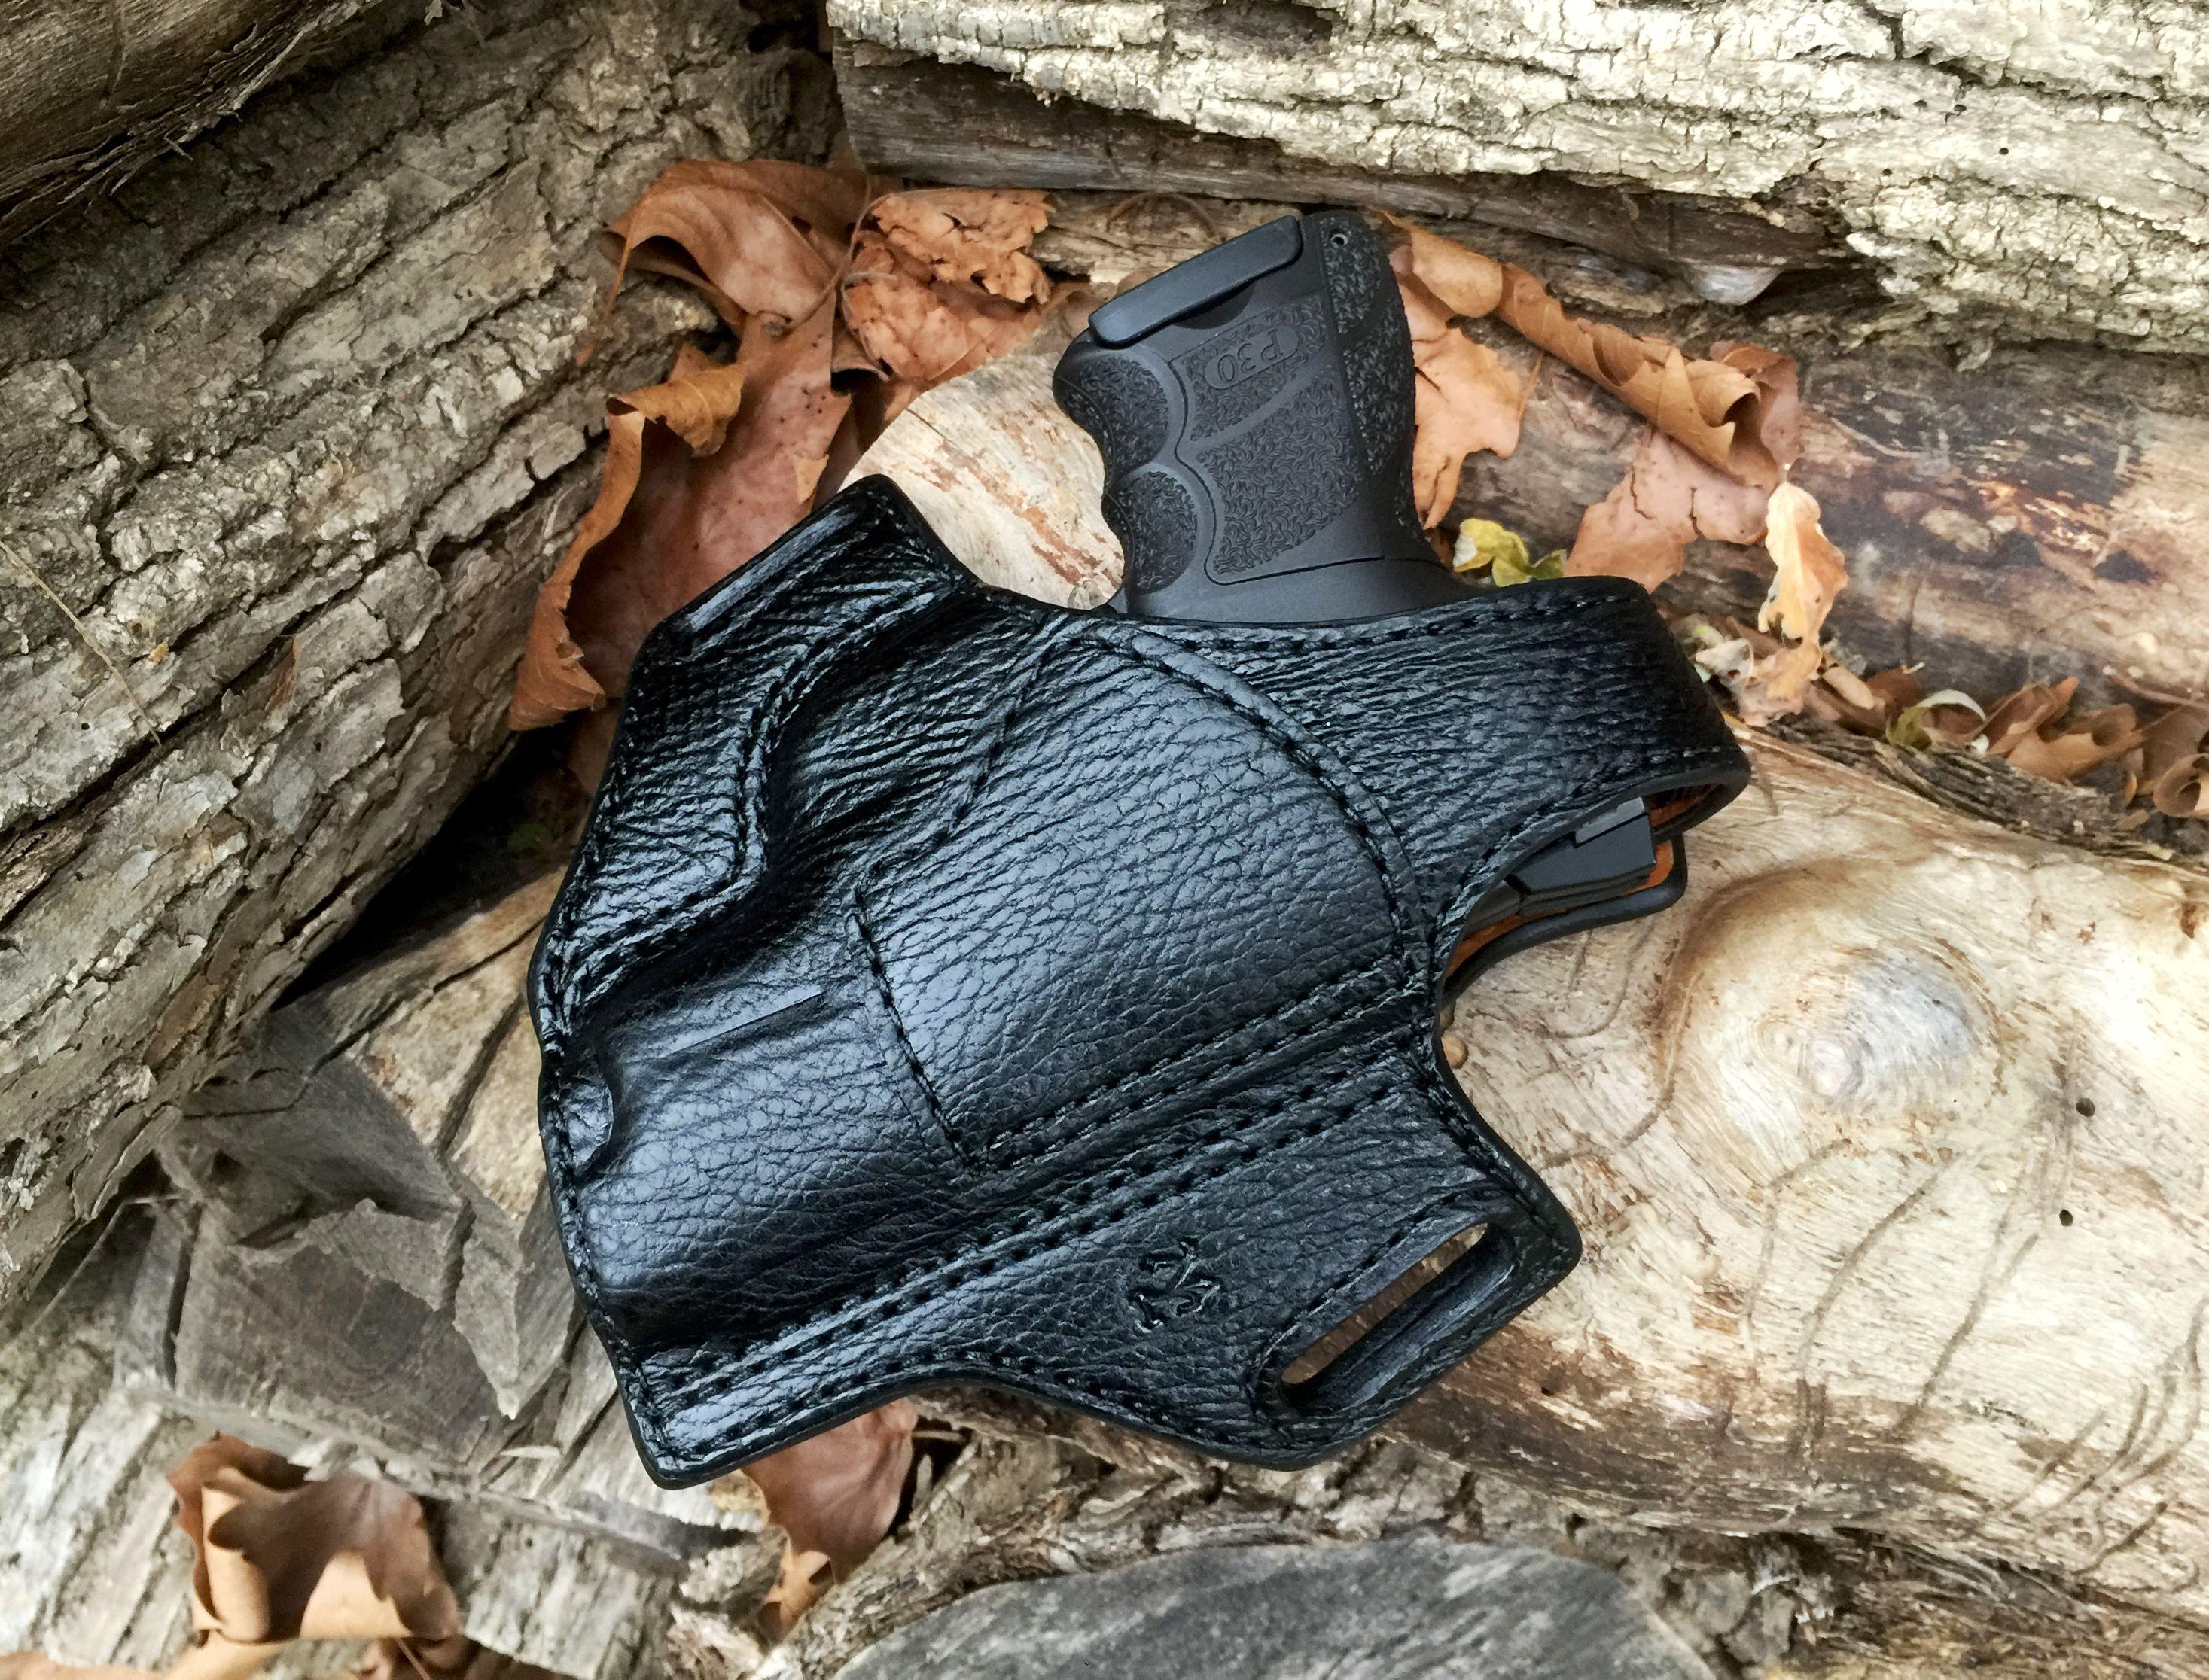 Osprey mens leather gloves - Nightingale Leather Hk P30sk Osprey Owb Holster Full Coverage Black Shark W Thumb Break